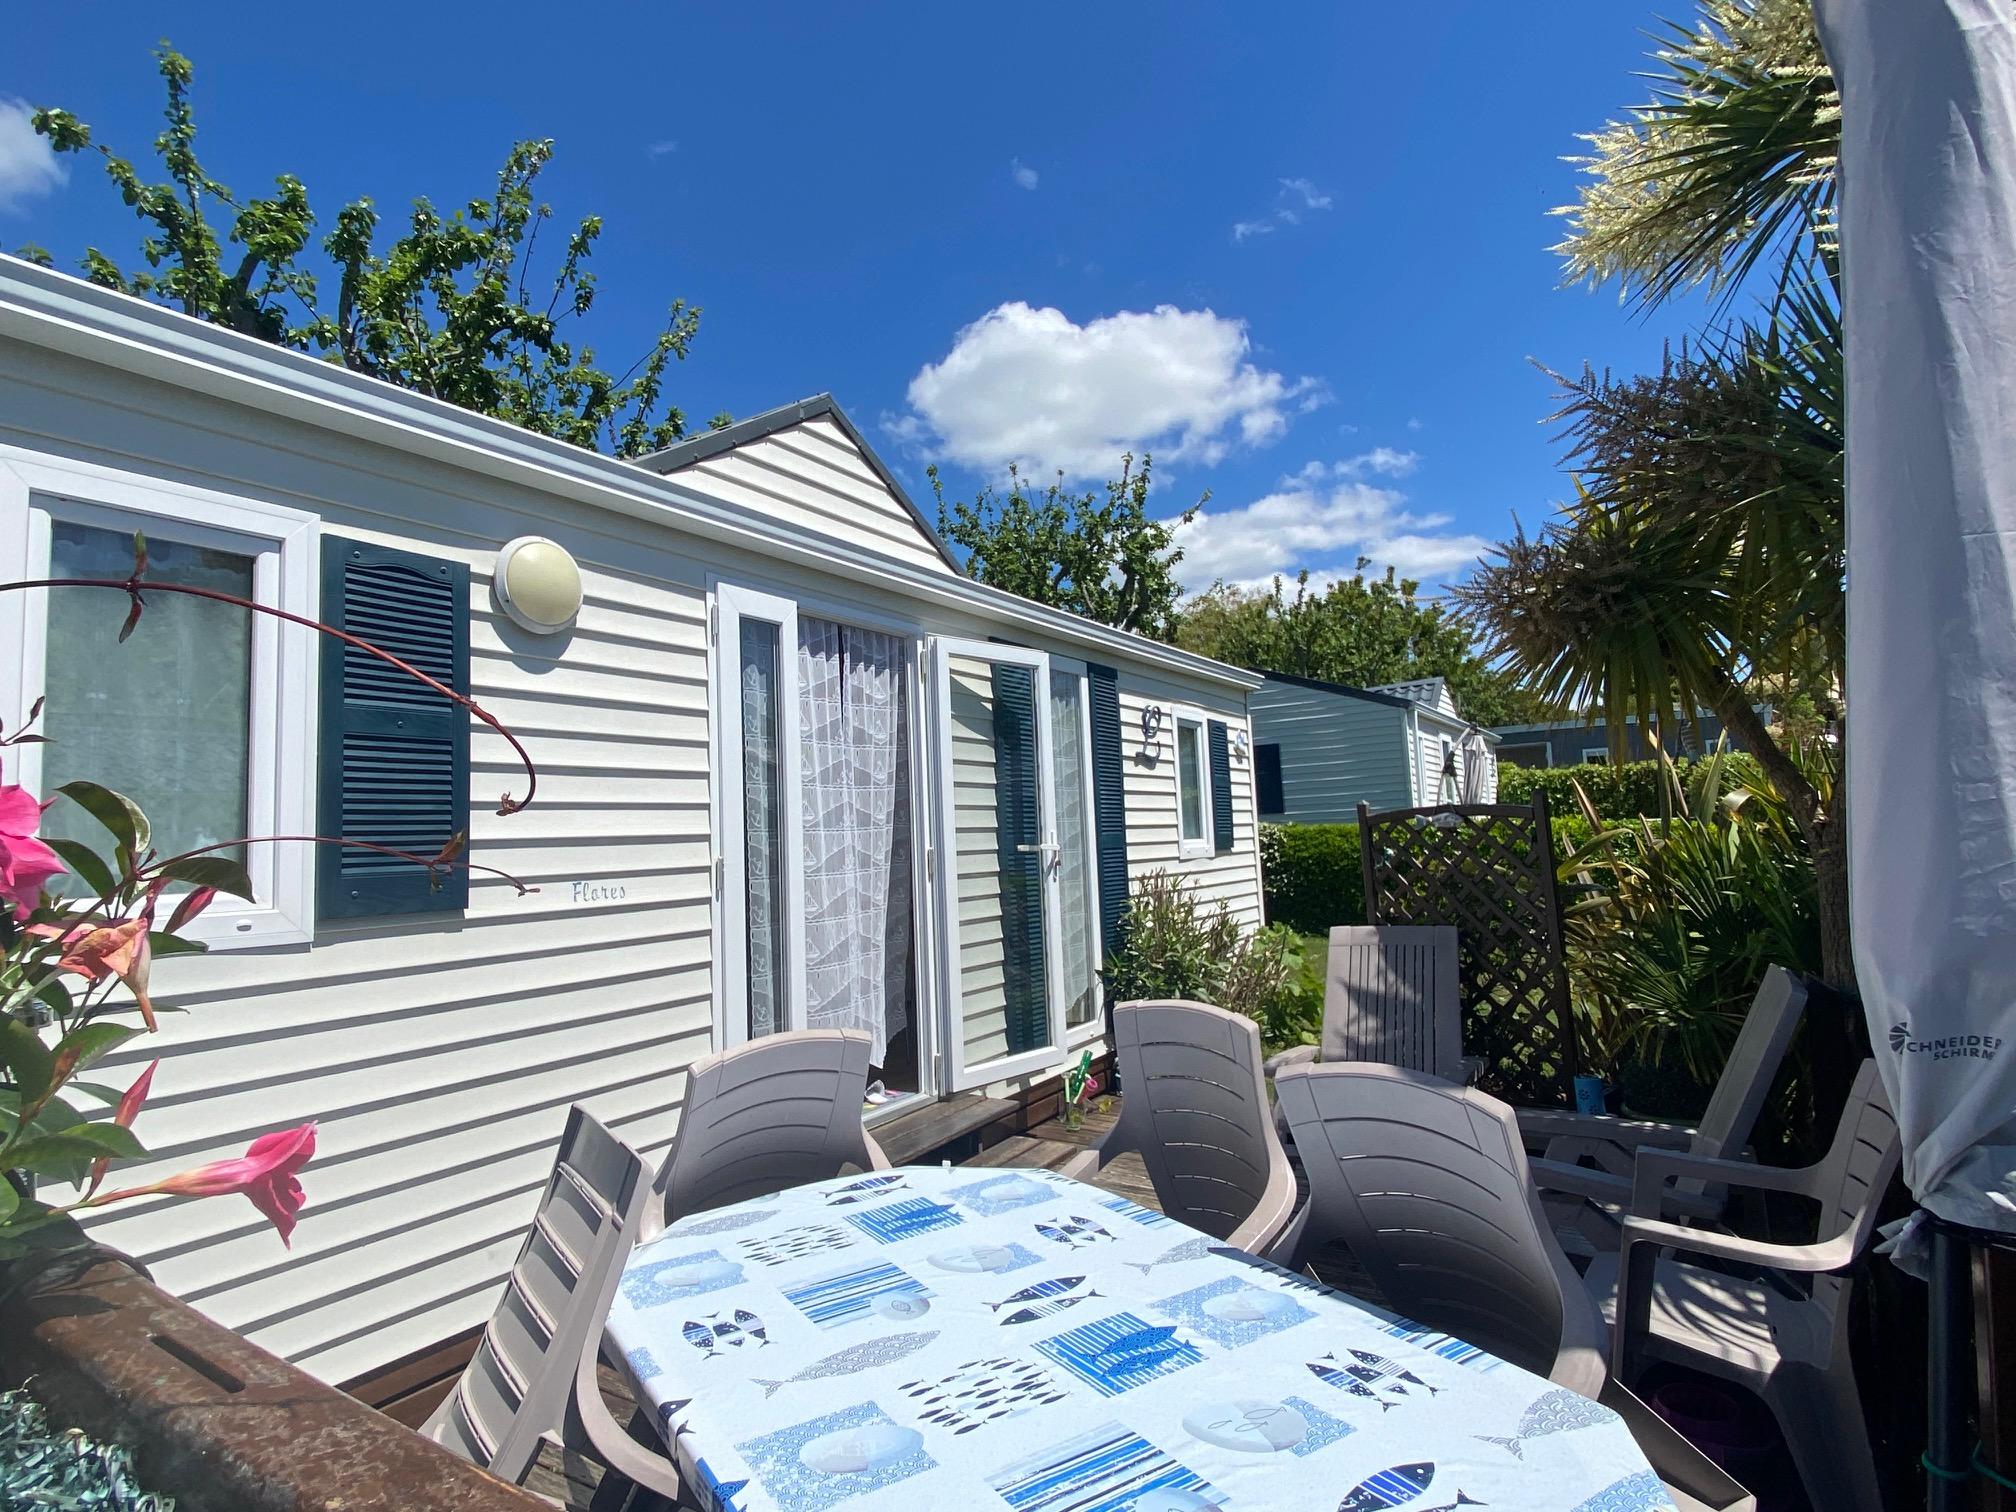 Location - Location Cottage 2 Chambres Avec Terrasse - Camping Les Embruns